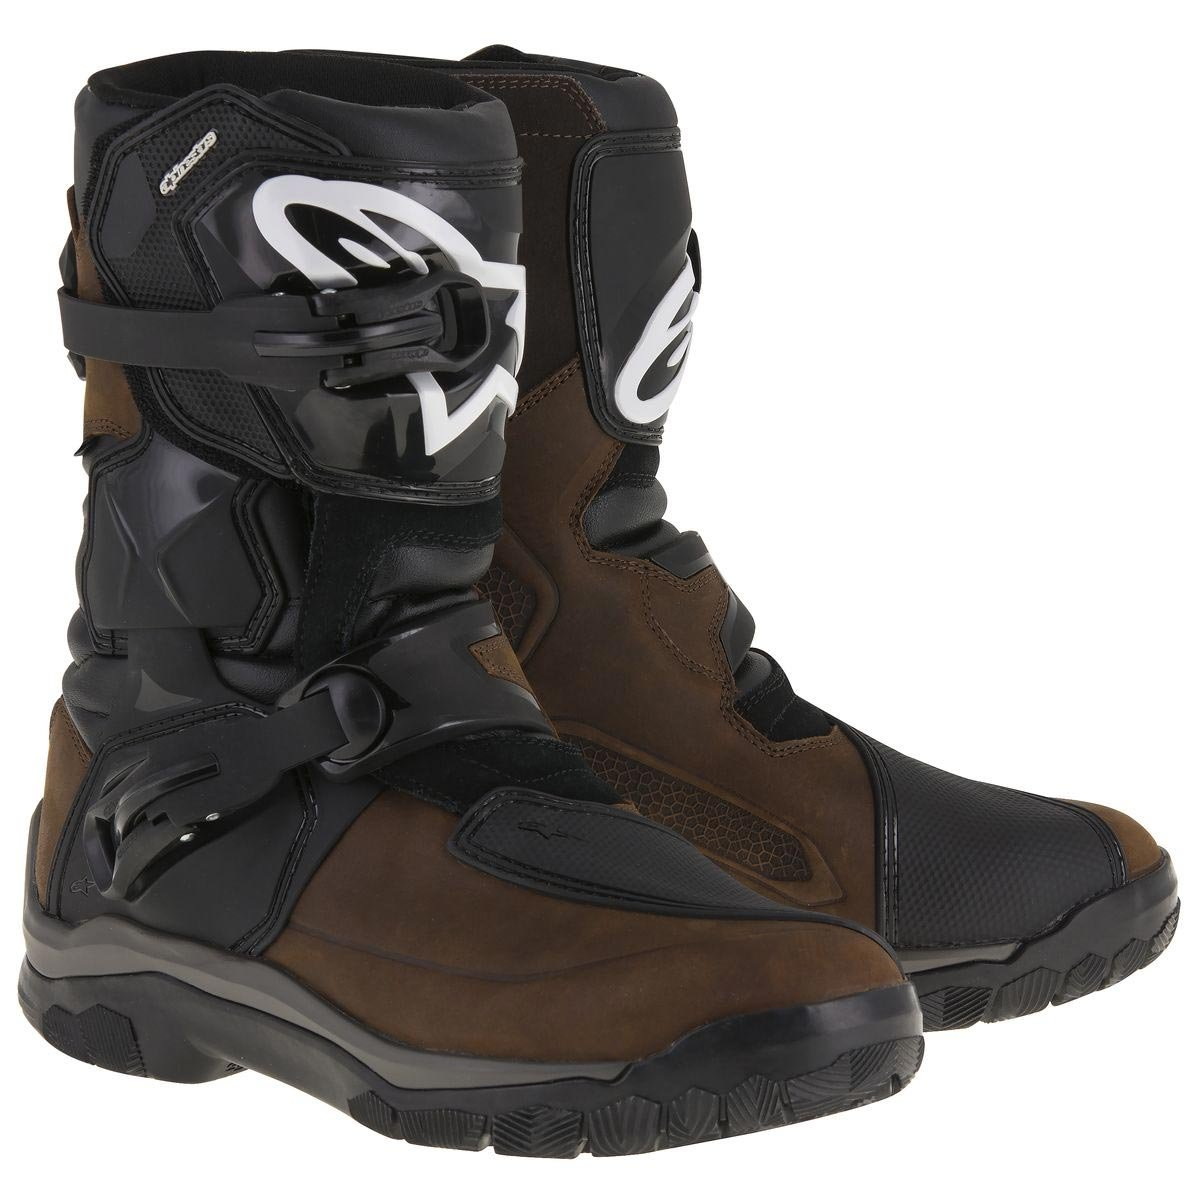 317d9d8069 80%OFF Alpinestars Belize Drystar Men's Street Motorcycle Boots - Brown  Oiled Leather / 11